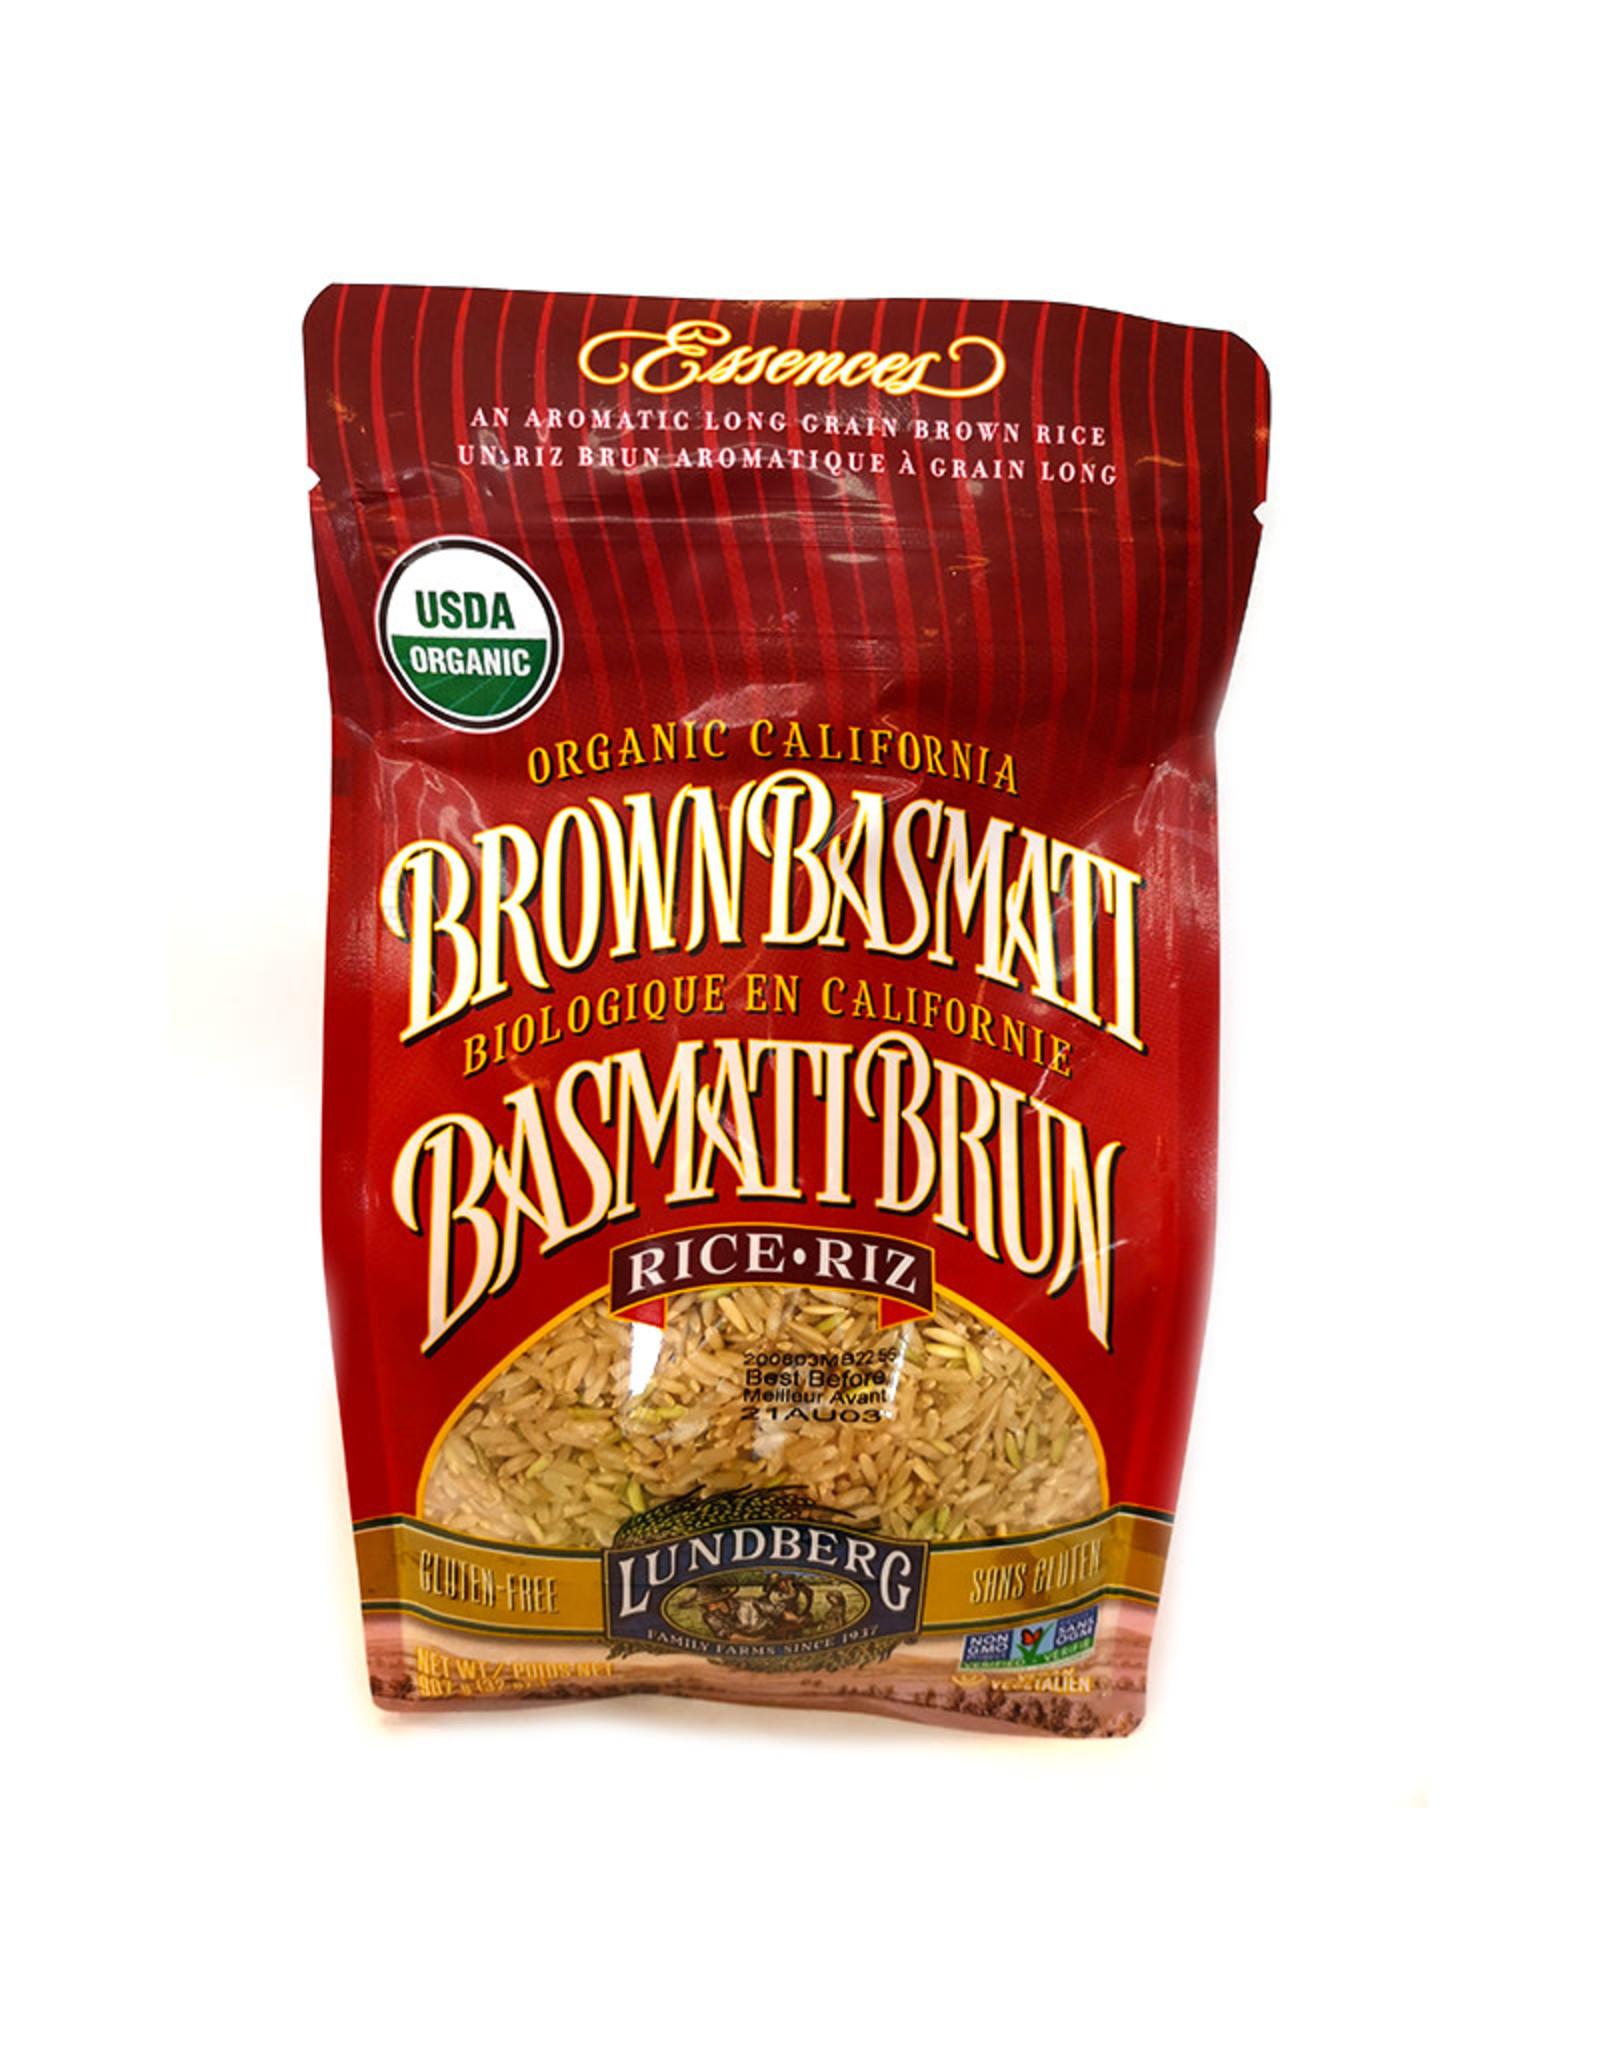 Lundberg Lundberg - Organic California Rice, White Basmati (907g)